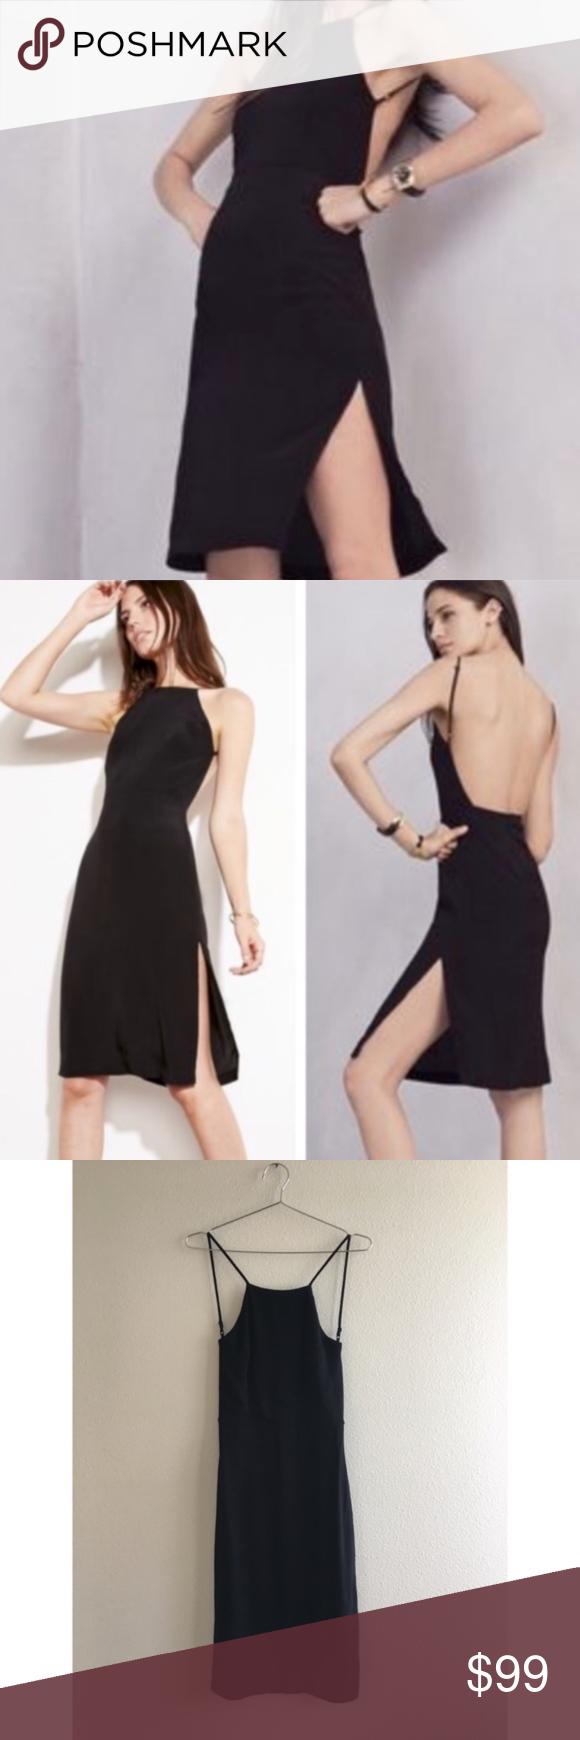 Reformation Eve Crepe Dress Black Classic Little Black Dress From Reformation Features Square Neckline Side Slits On Both S Crepe Dress Black Dress Dresses [ 1740 x 580 Pixel ]